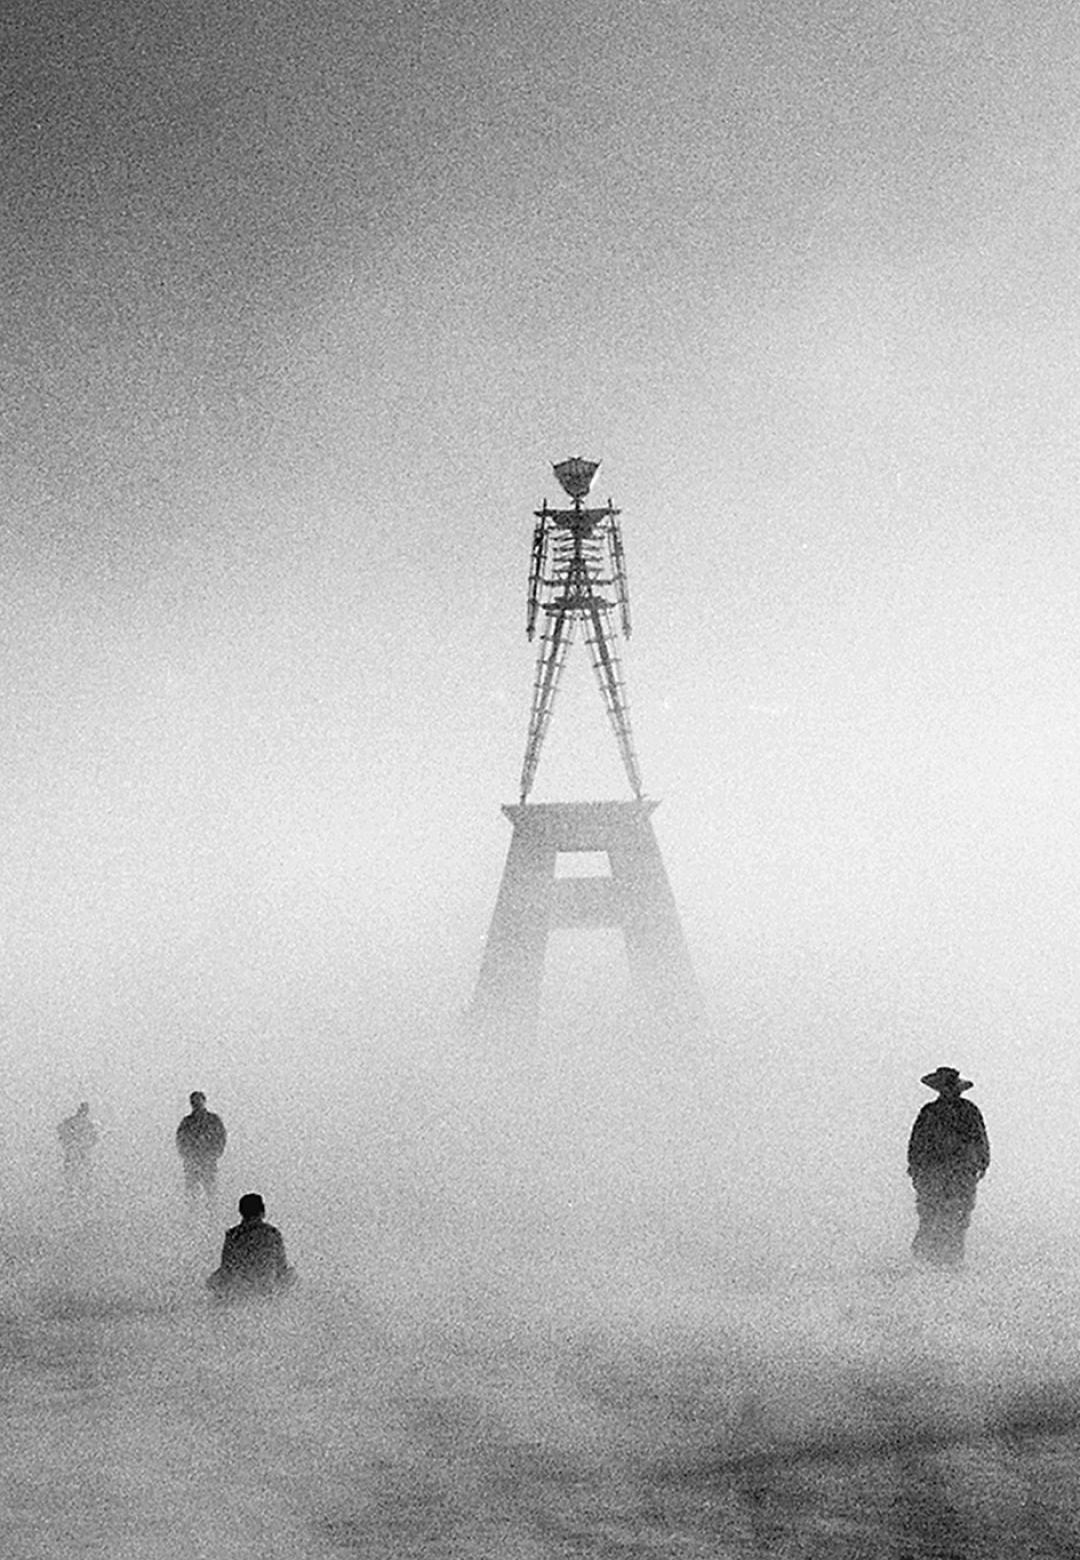 Stewart Harvey, Figures with Dusty Man, 2001   No Spectators: The Art of Burning Man   Oakland Museum of California   STIRworld